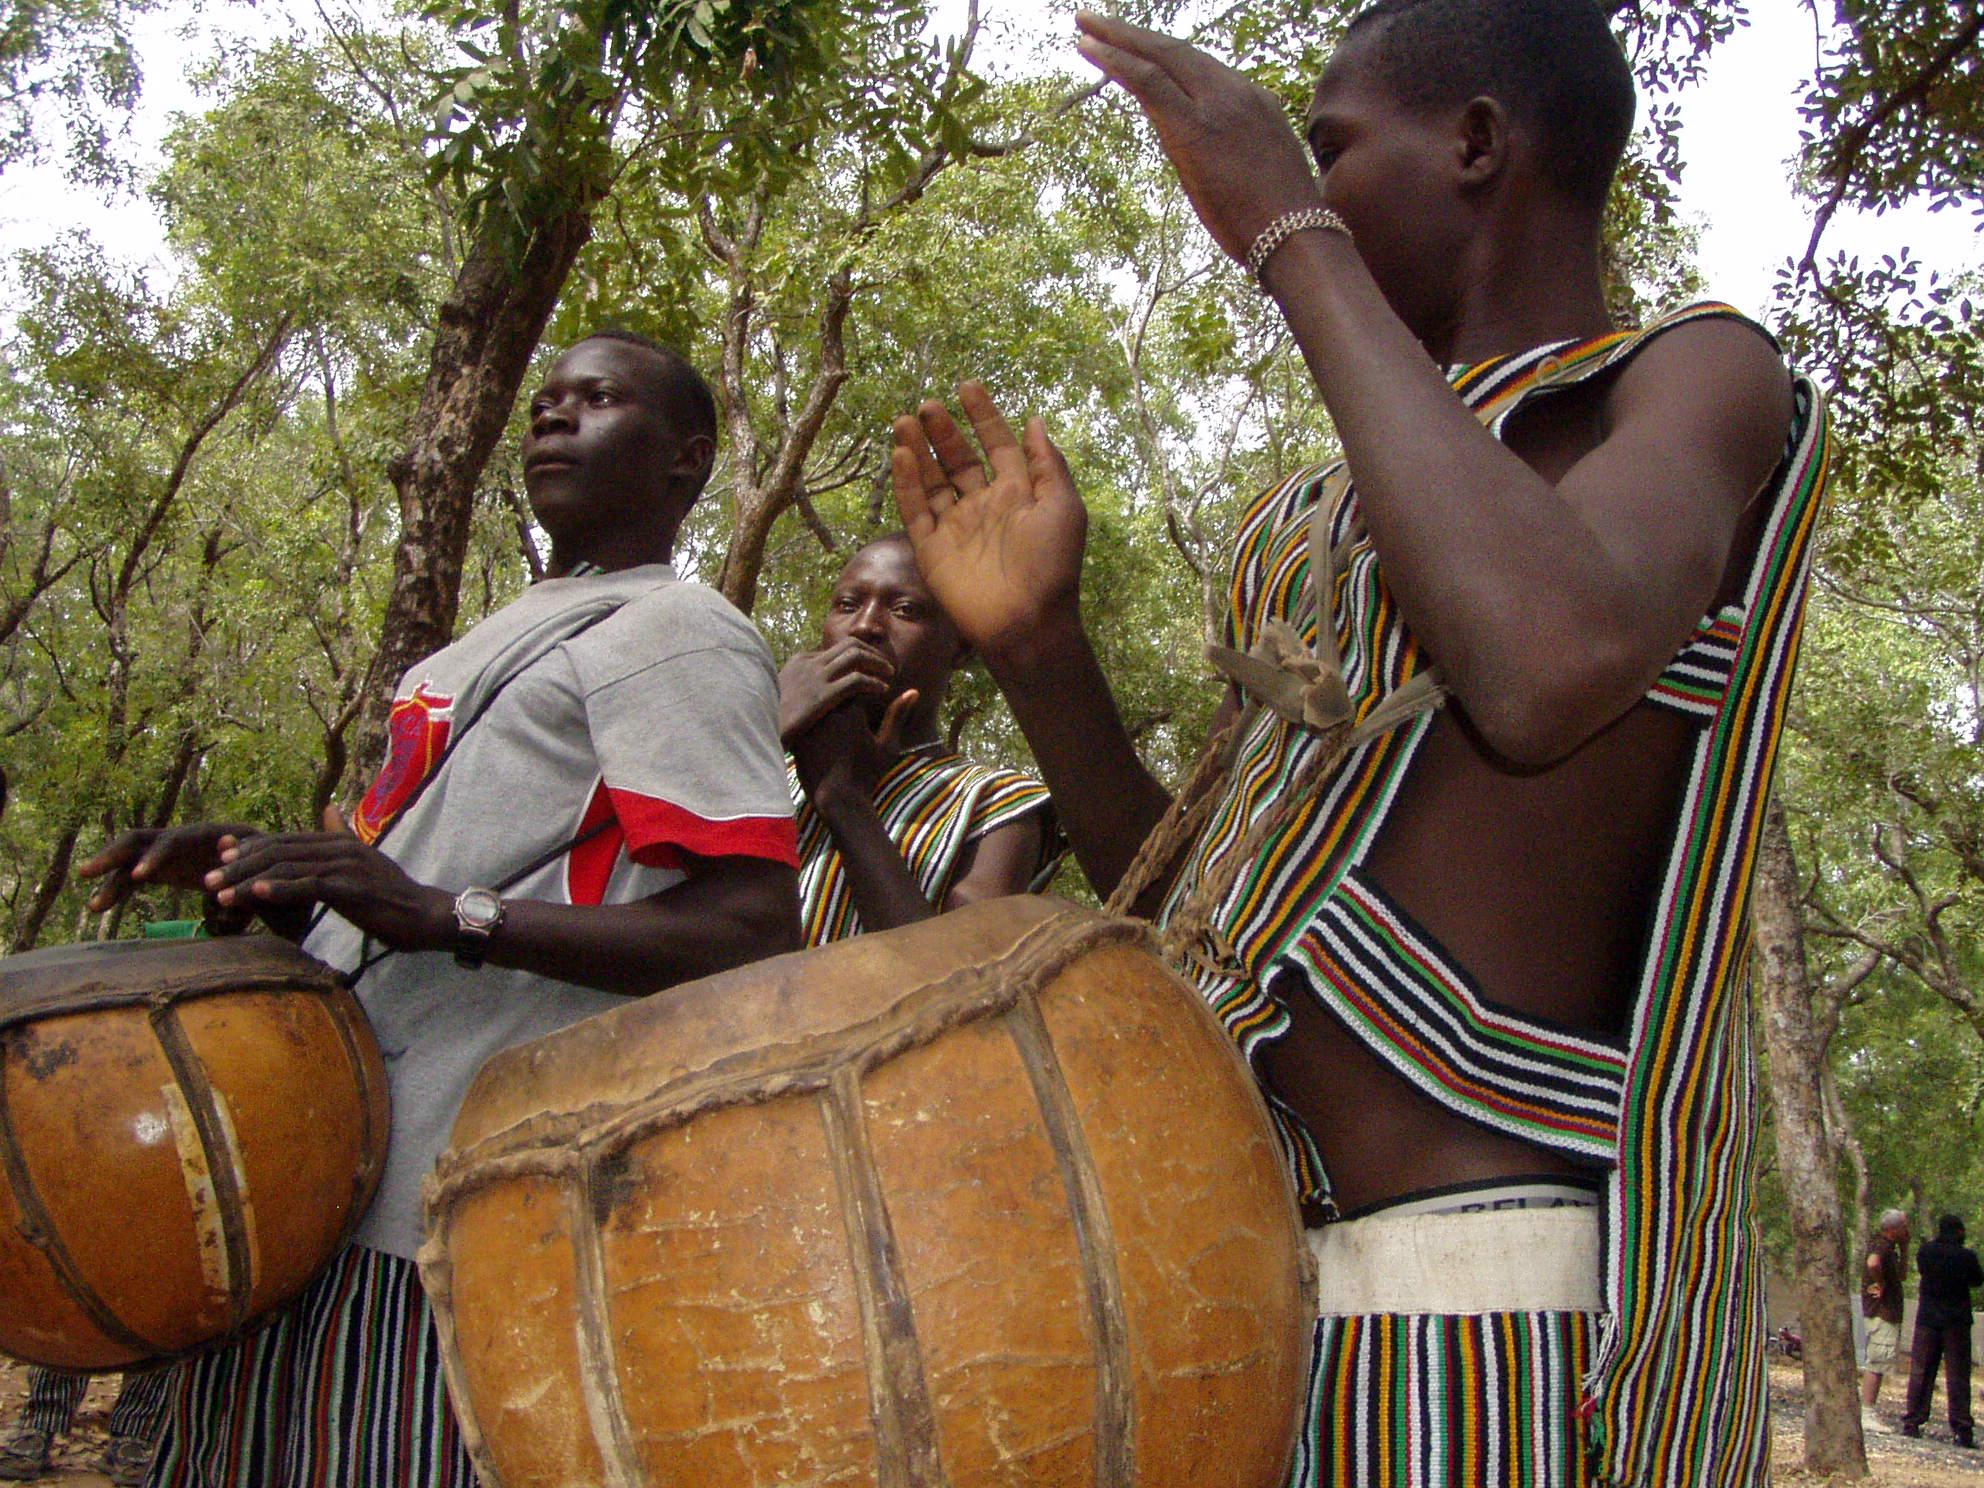 Musiciens avec leurs tambours. Musicians with their drums.